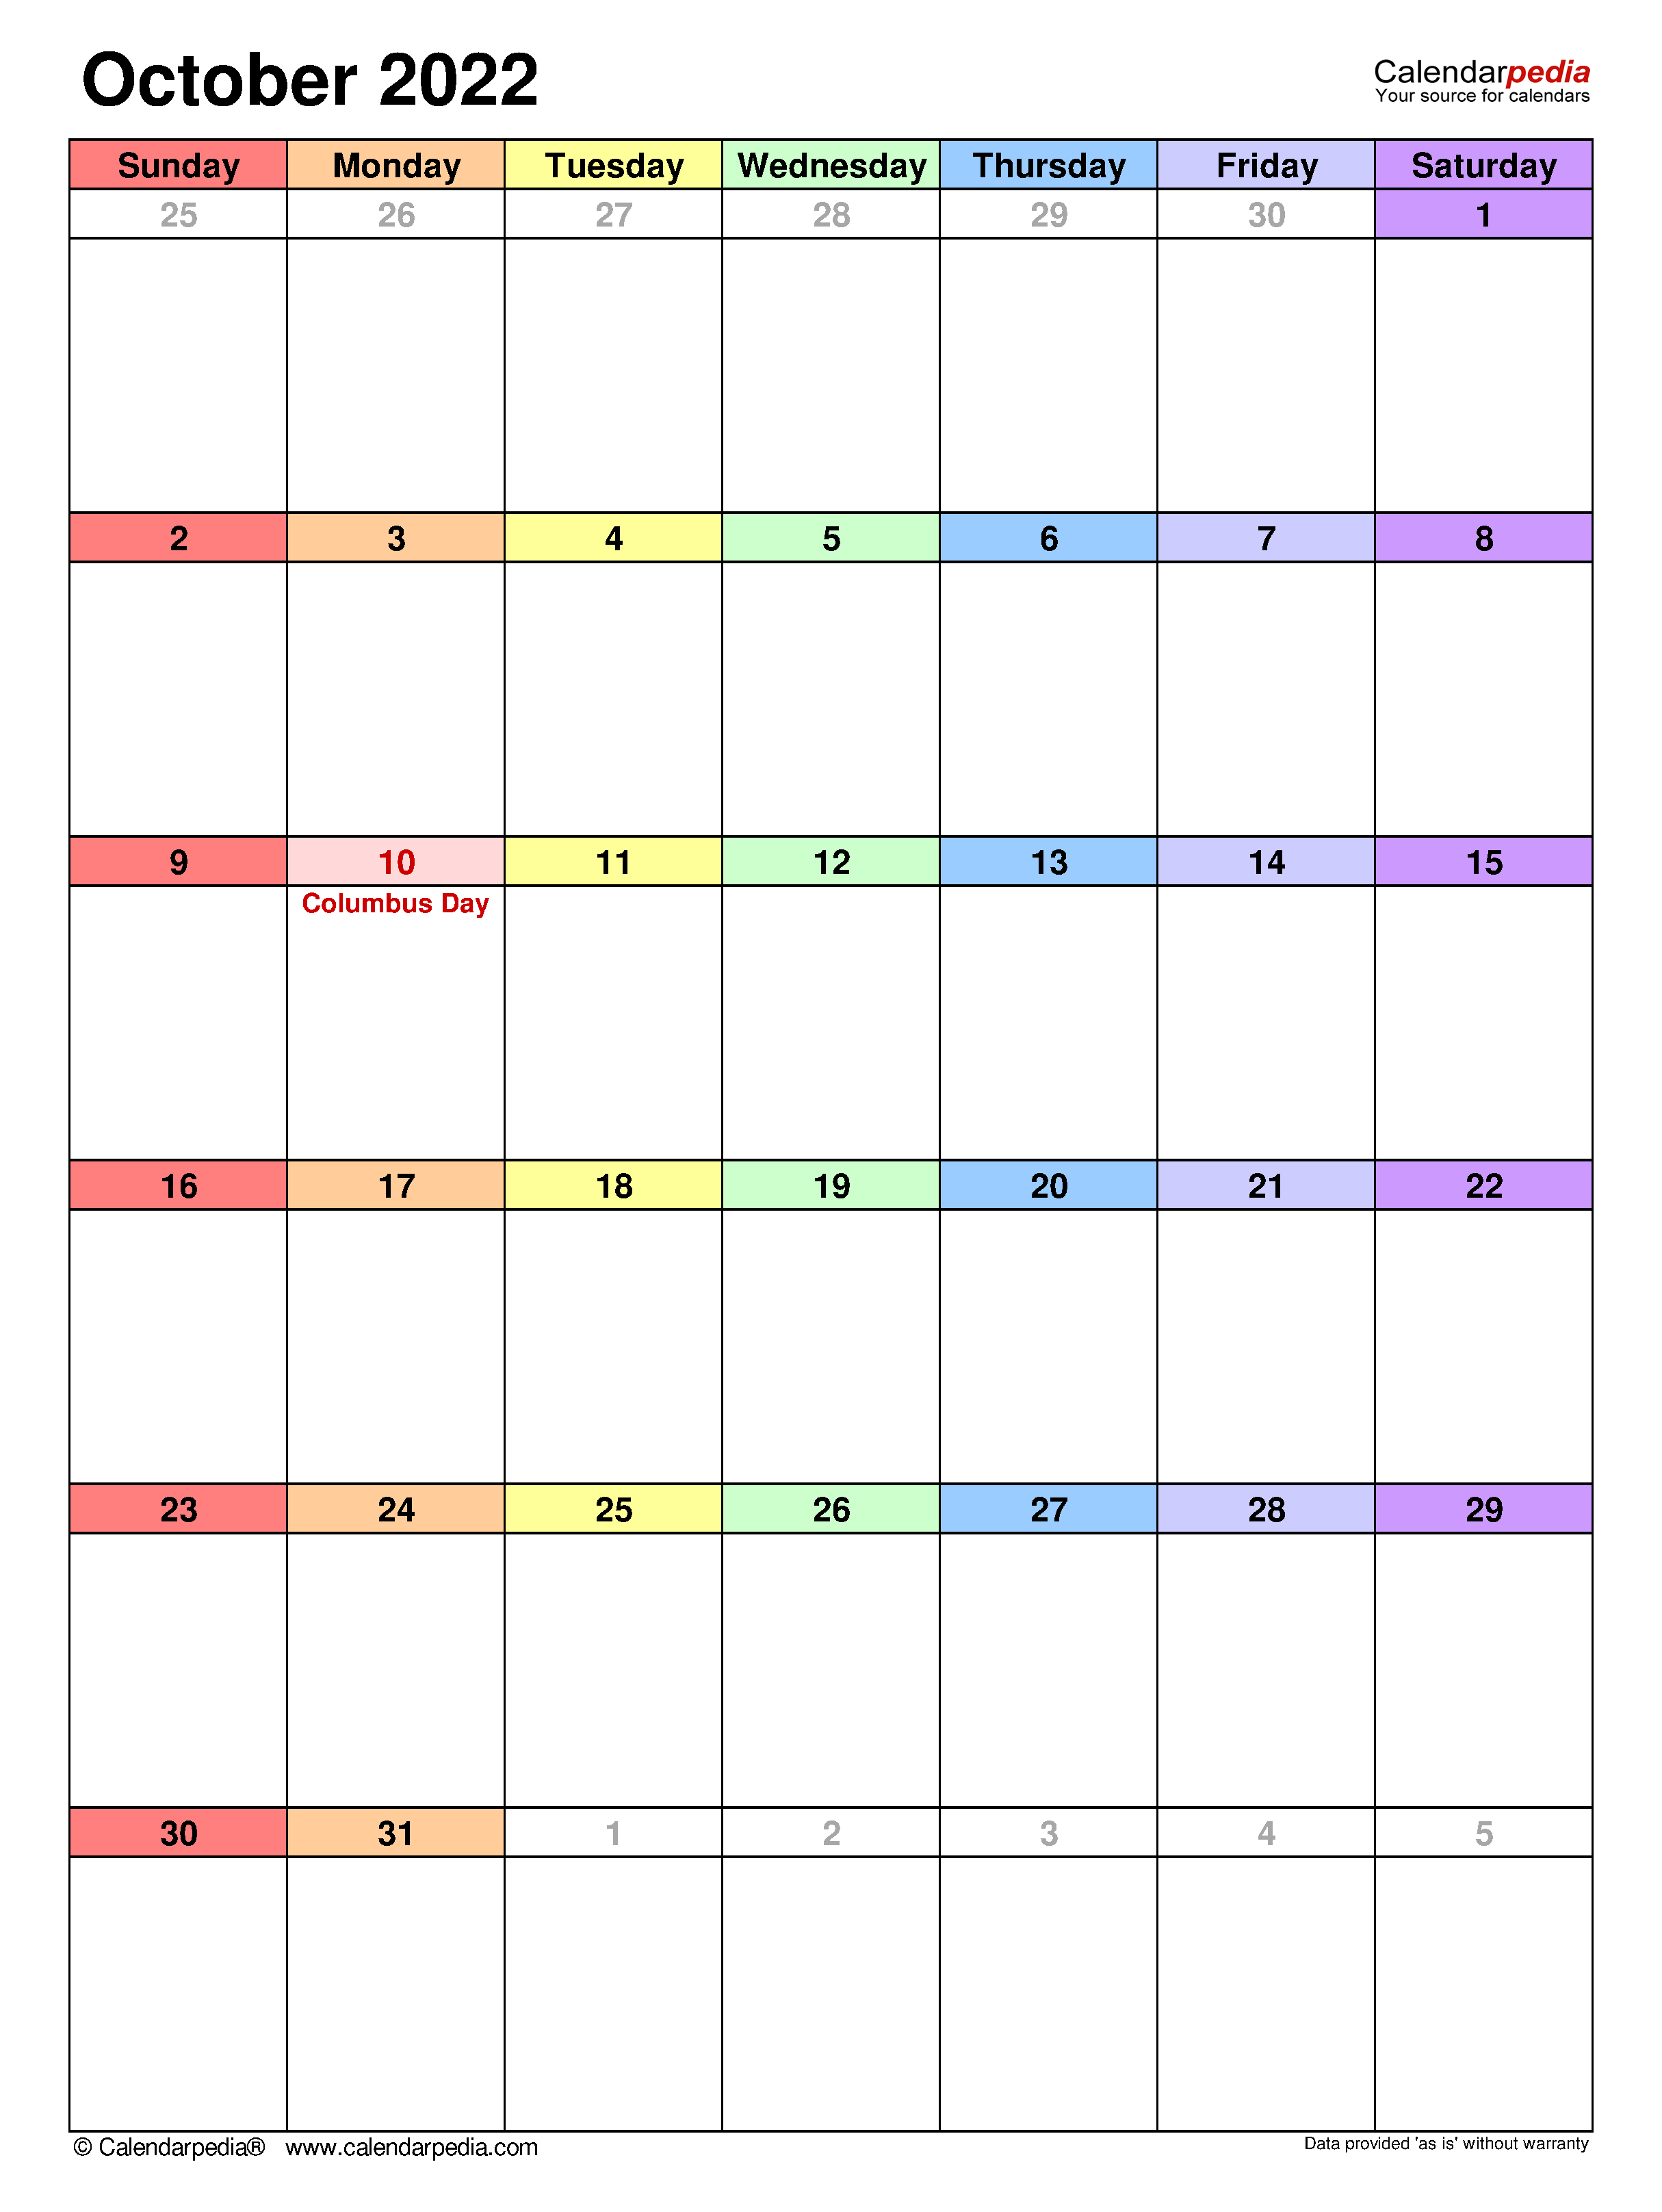 October 2022 Calendar Word.October 2022 Calendar Templates For Word Excel And Pdf